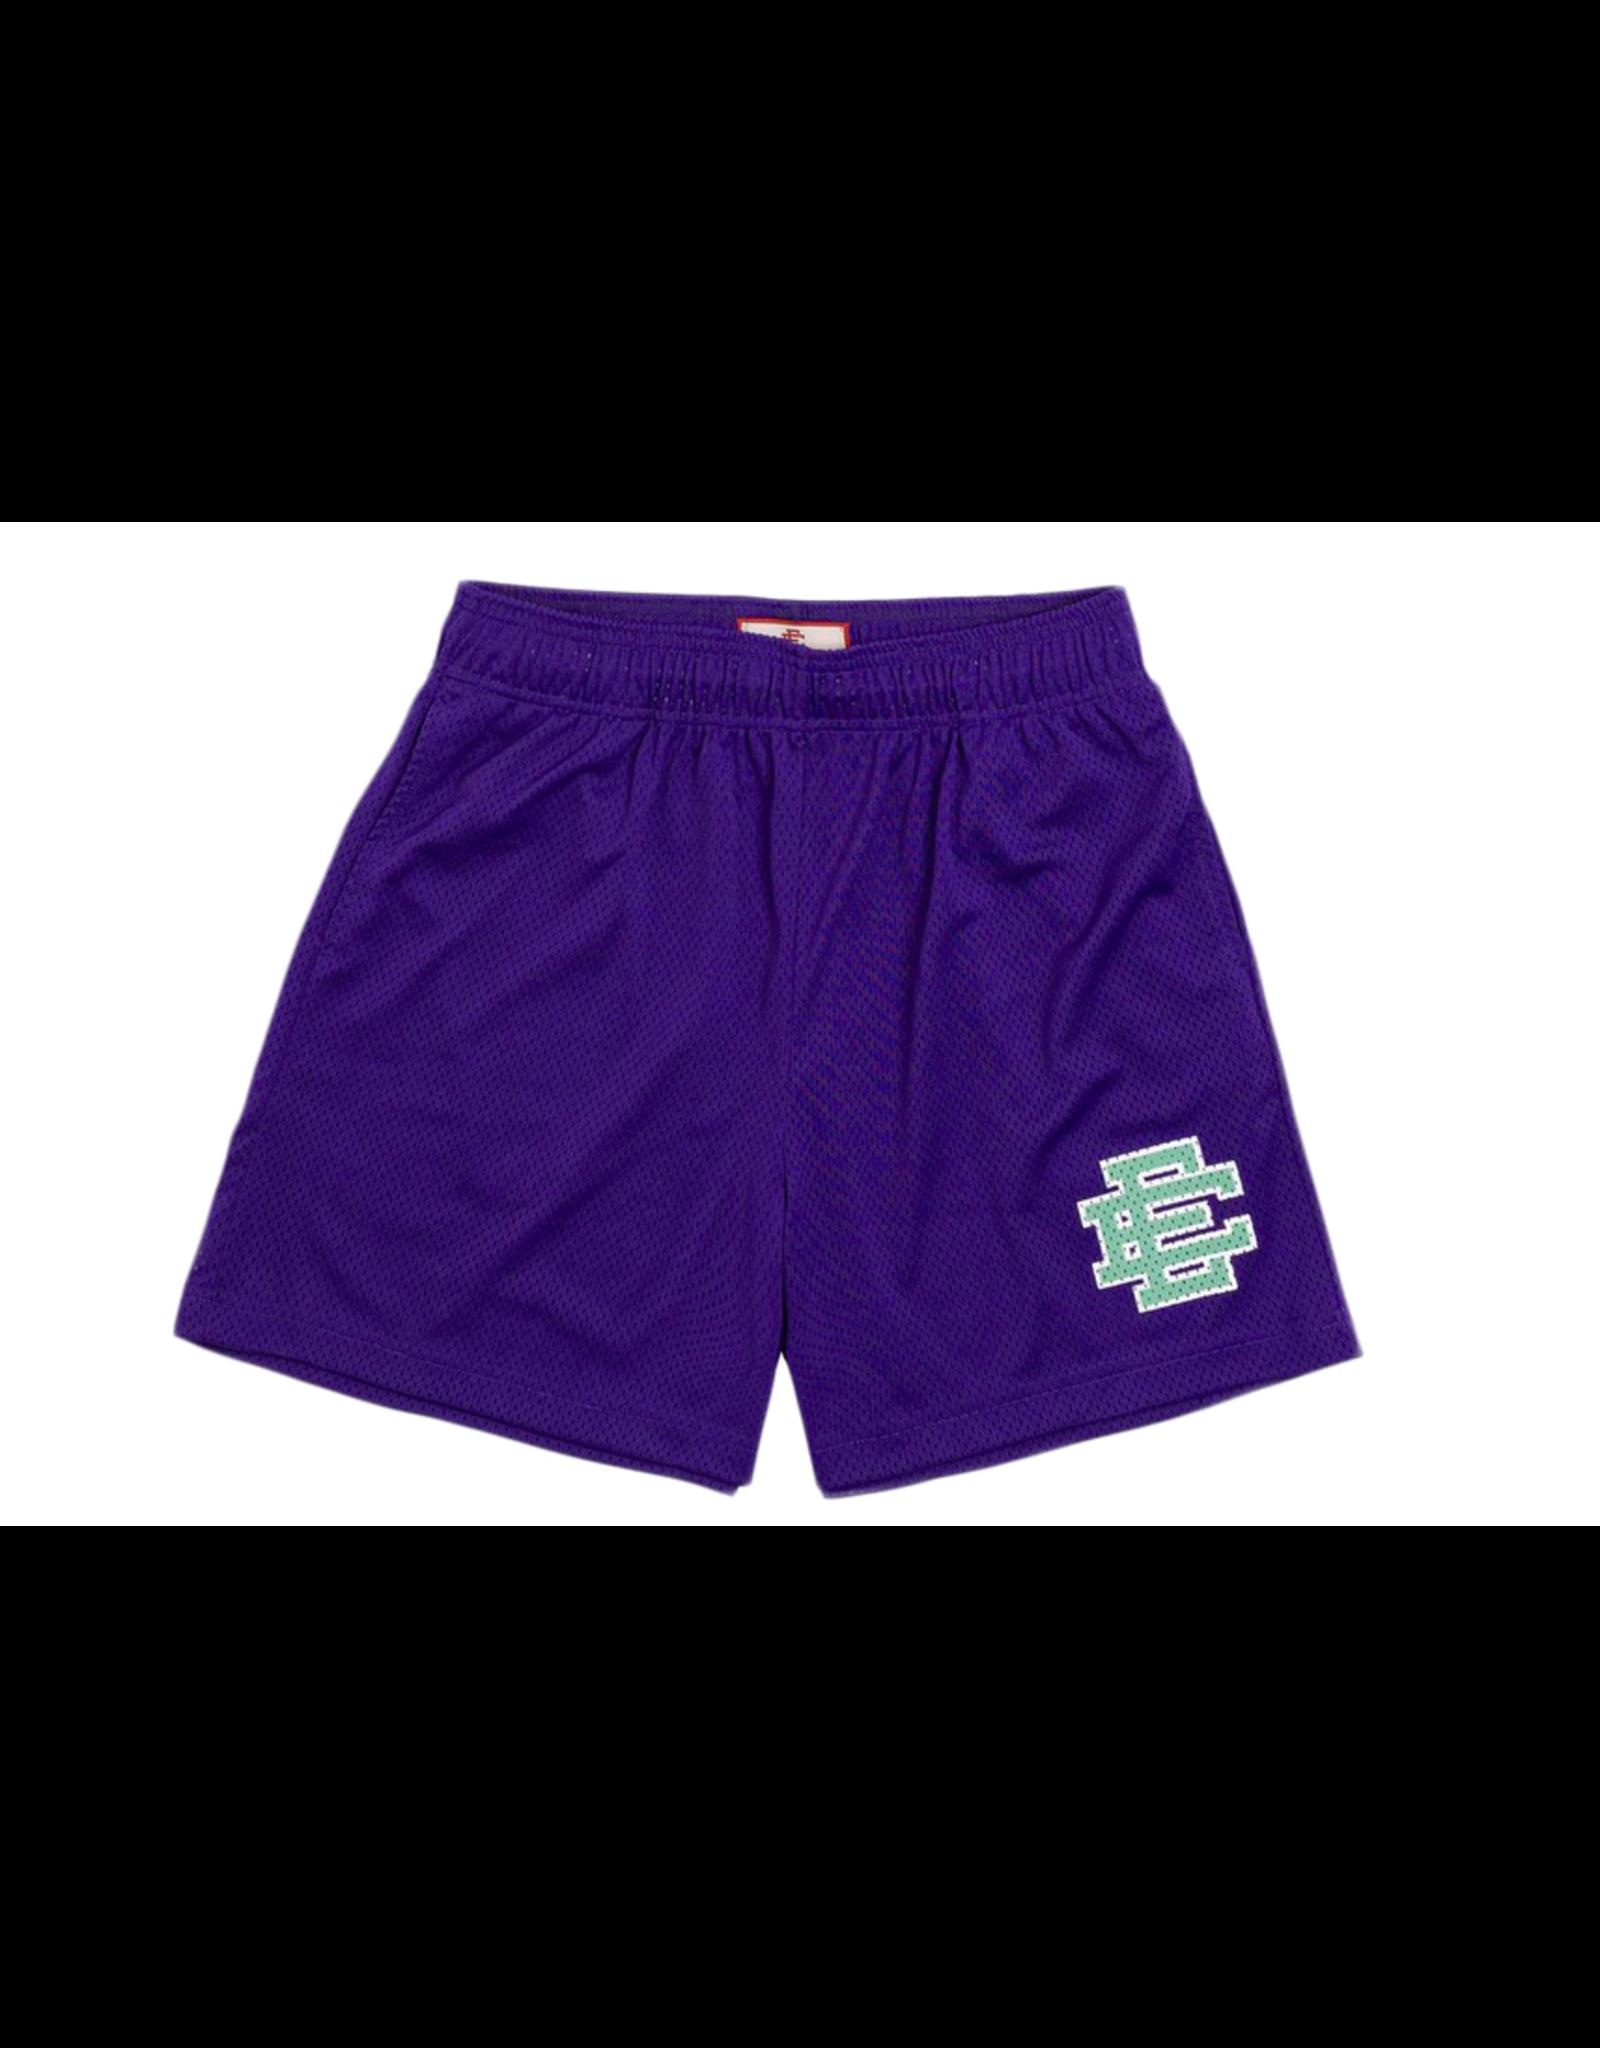 ERIC EMANUEL EE Basic Short Purple/Seafoam